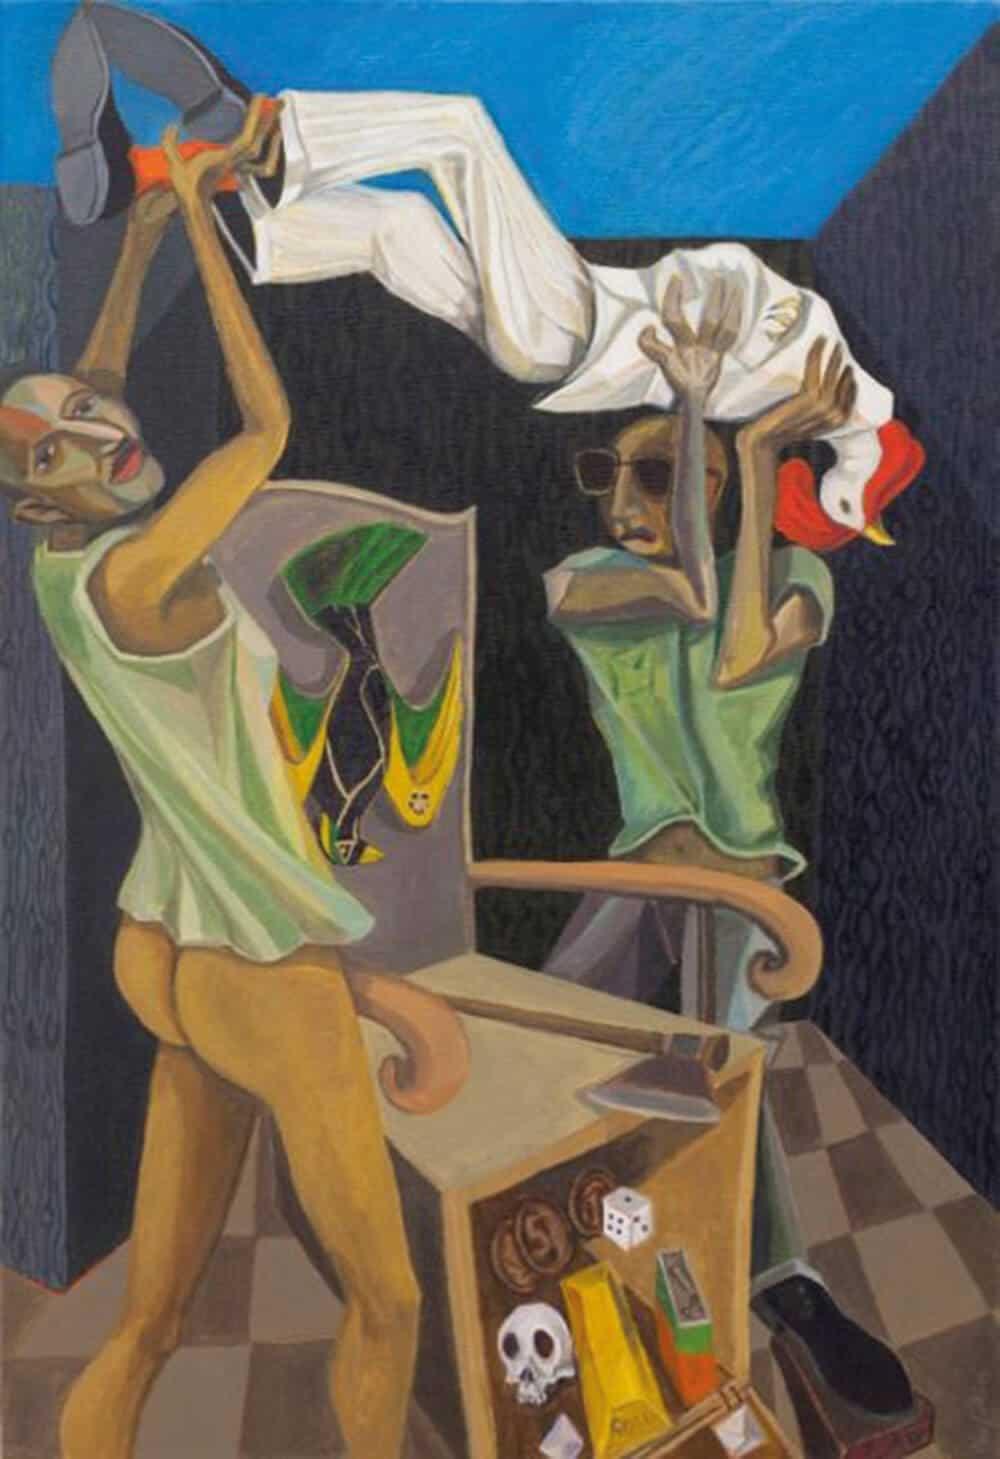 Richard Mudariki, Coupd'etat (2013) acrylic on canvas, 95x65 cm